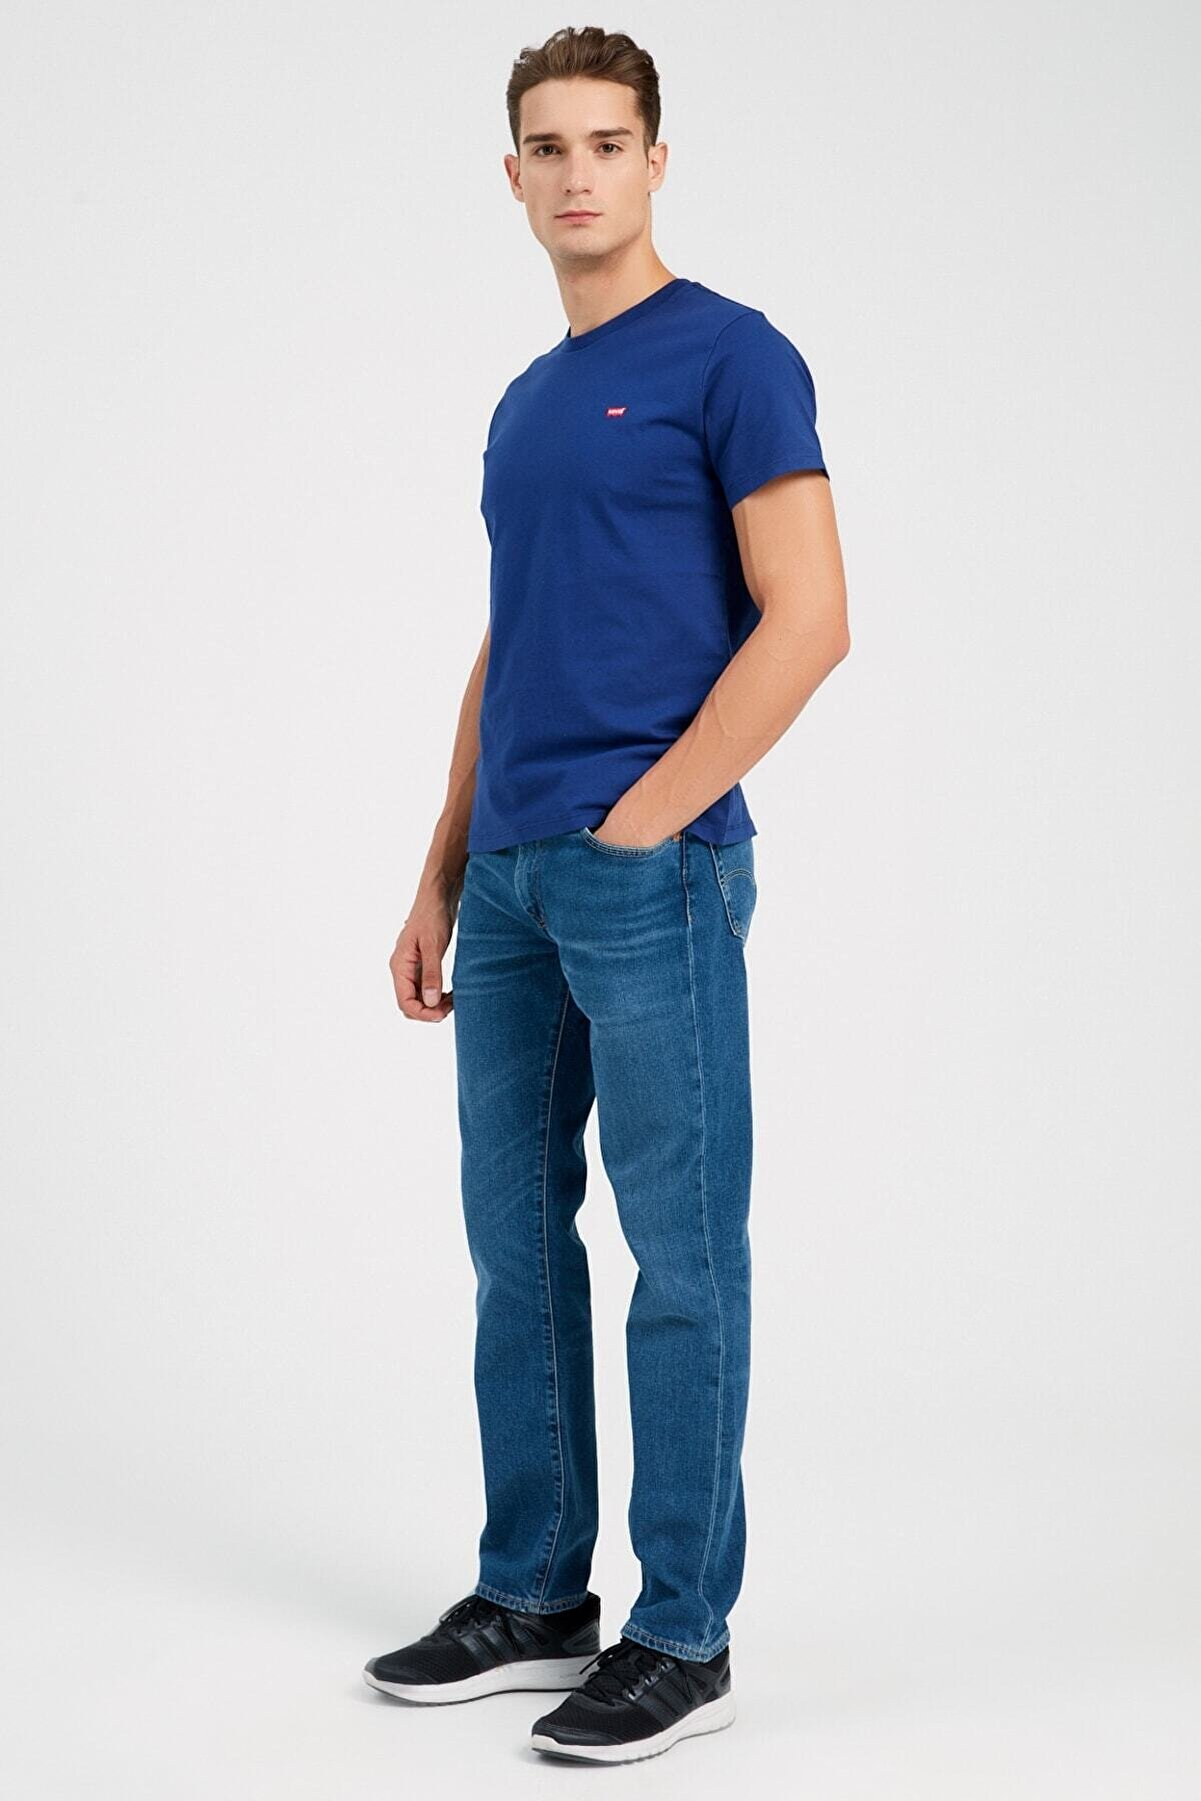 Levi's Erkek 511 Slim Poncho Jean 04511-4886